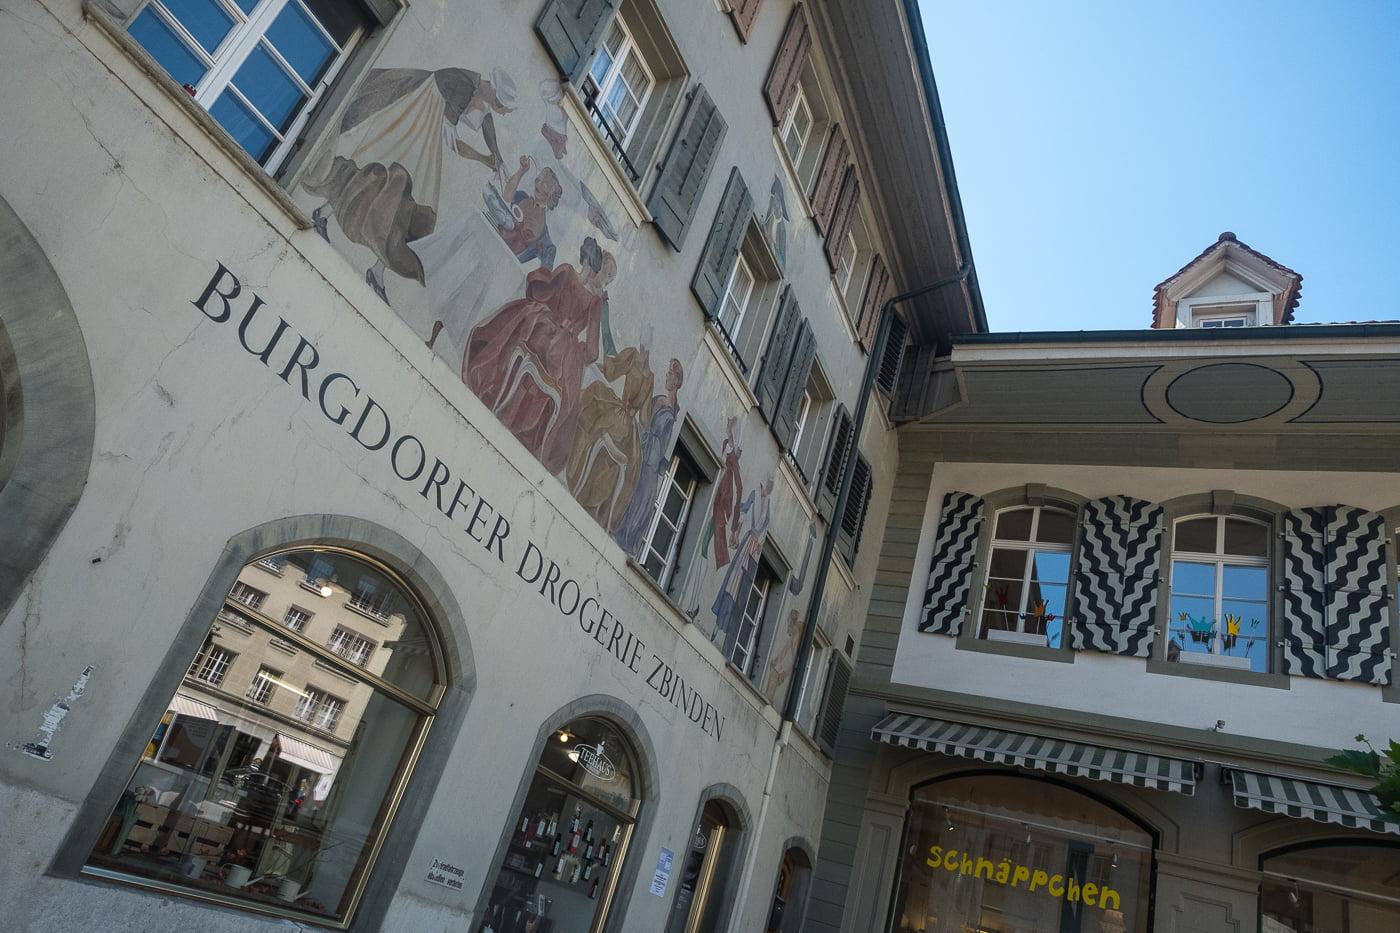 Burgdorfer Drogerie Zbinden